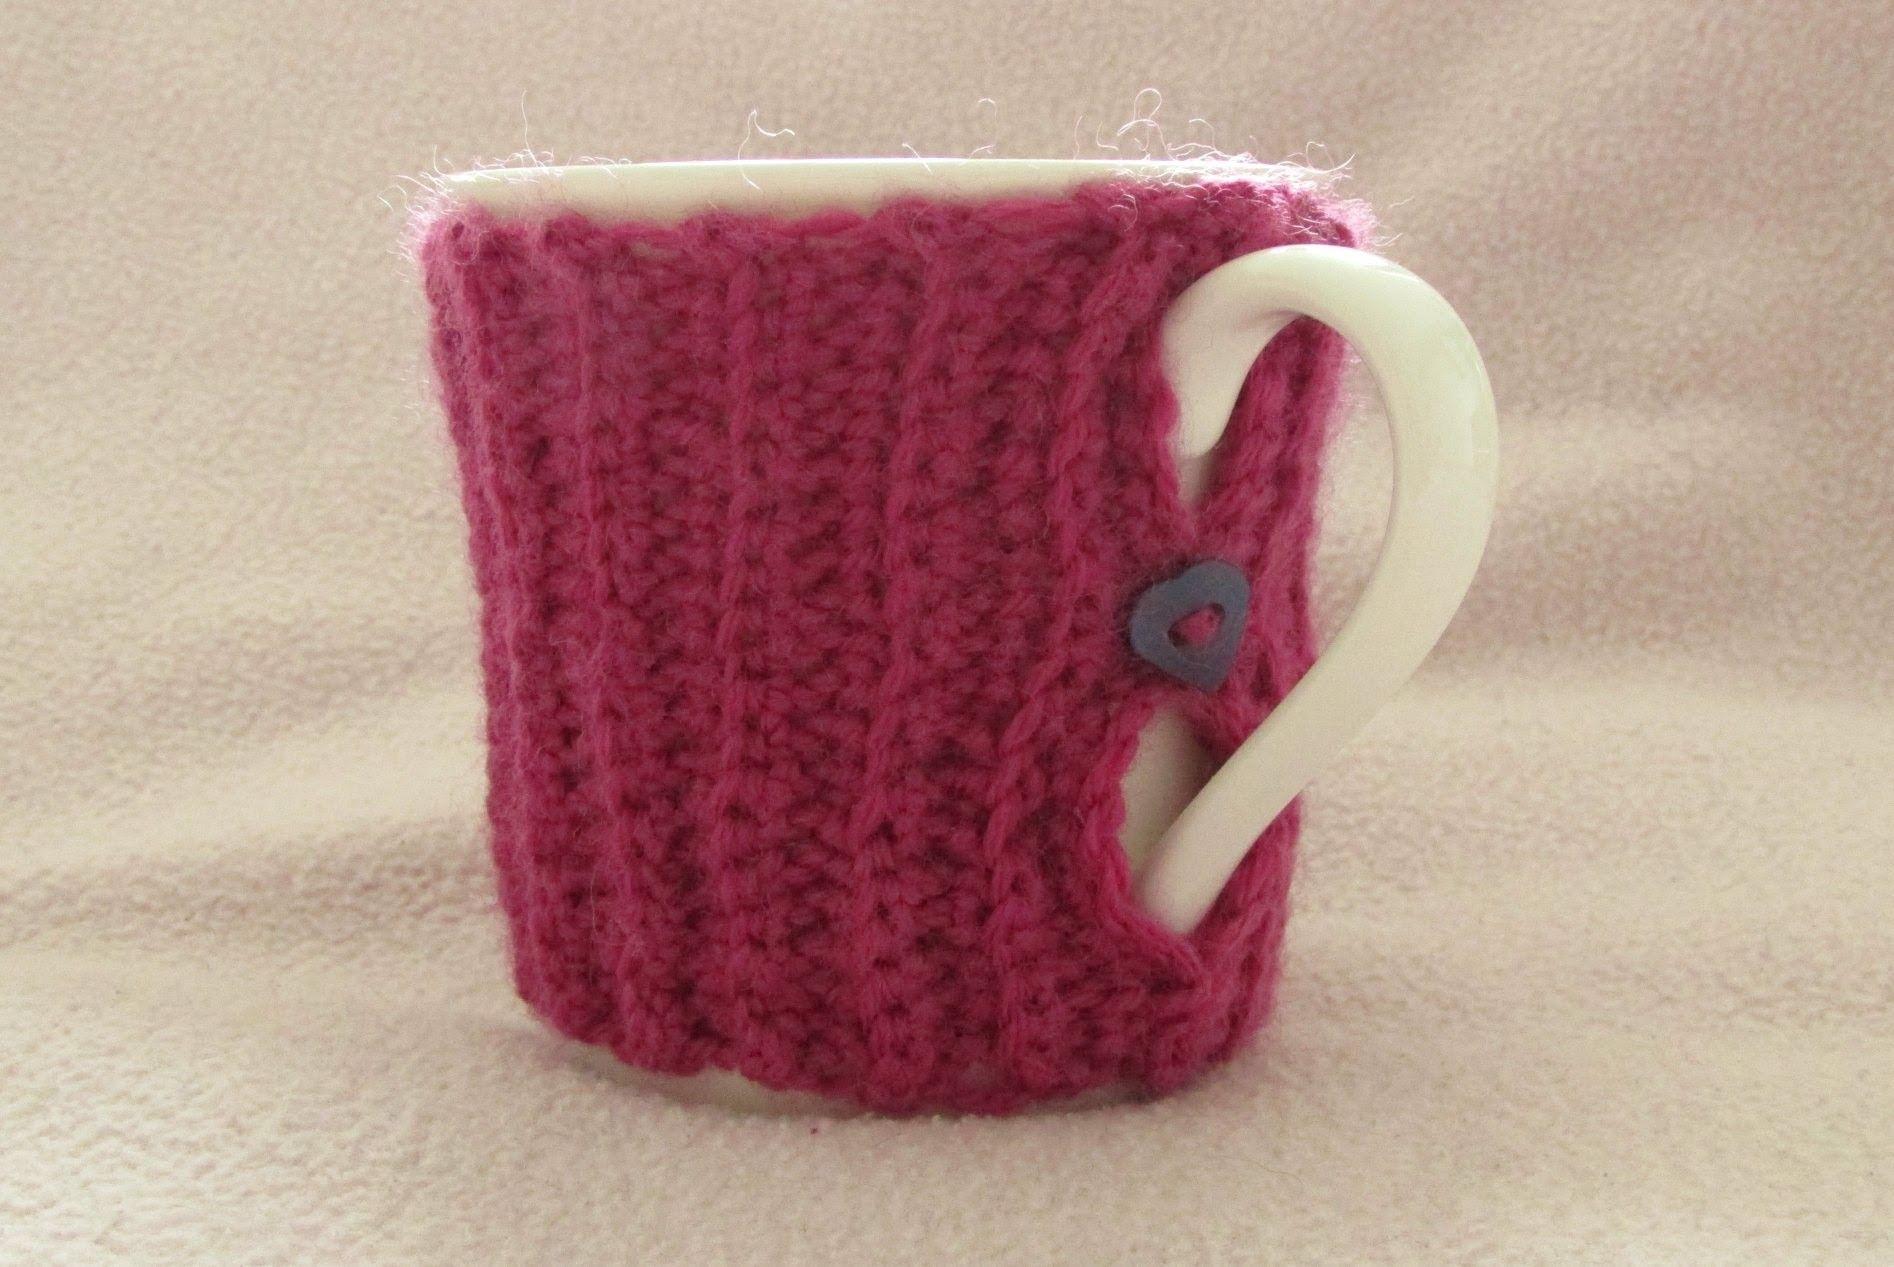 VERY EASY crochet mug cozy tutorial - ribbed crochet mug cozy